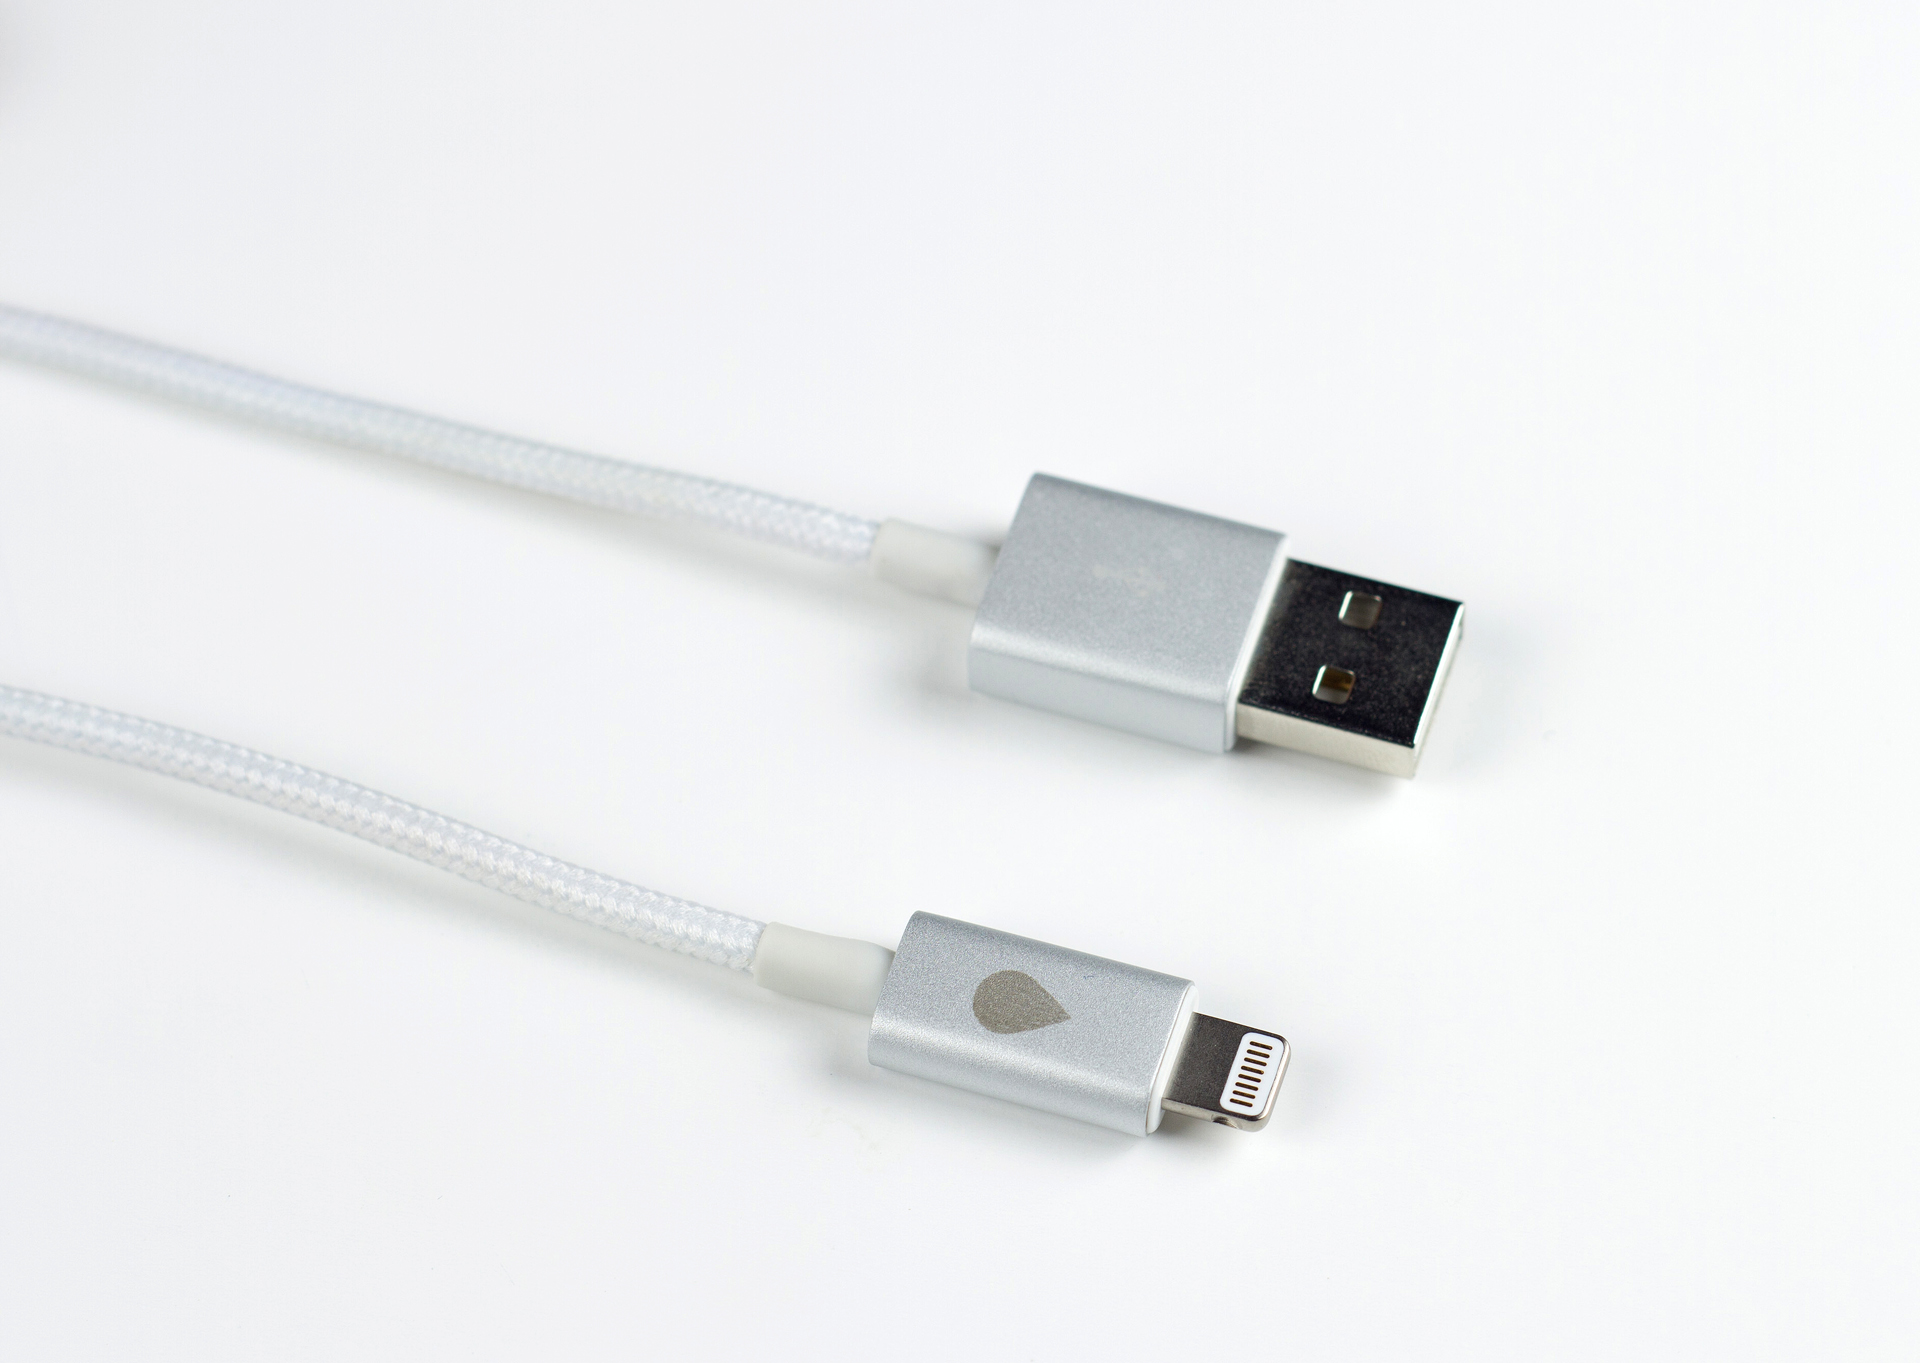 JUICIES+: лучшие кабели для iPhone 5s